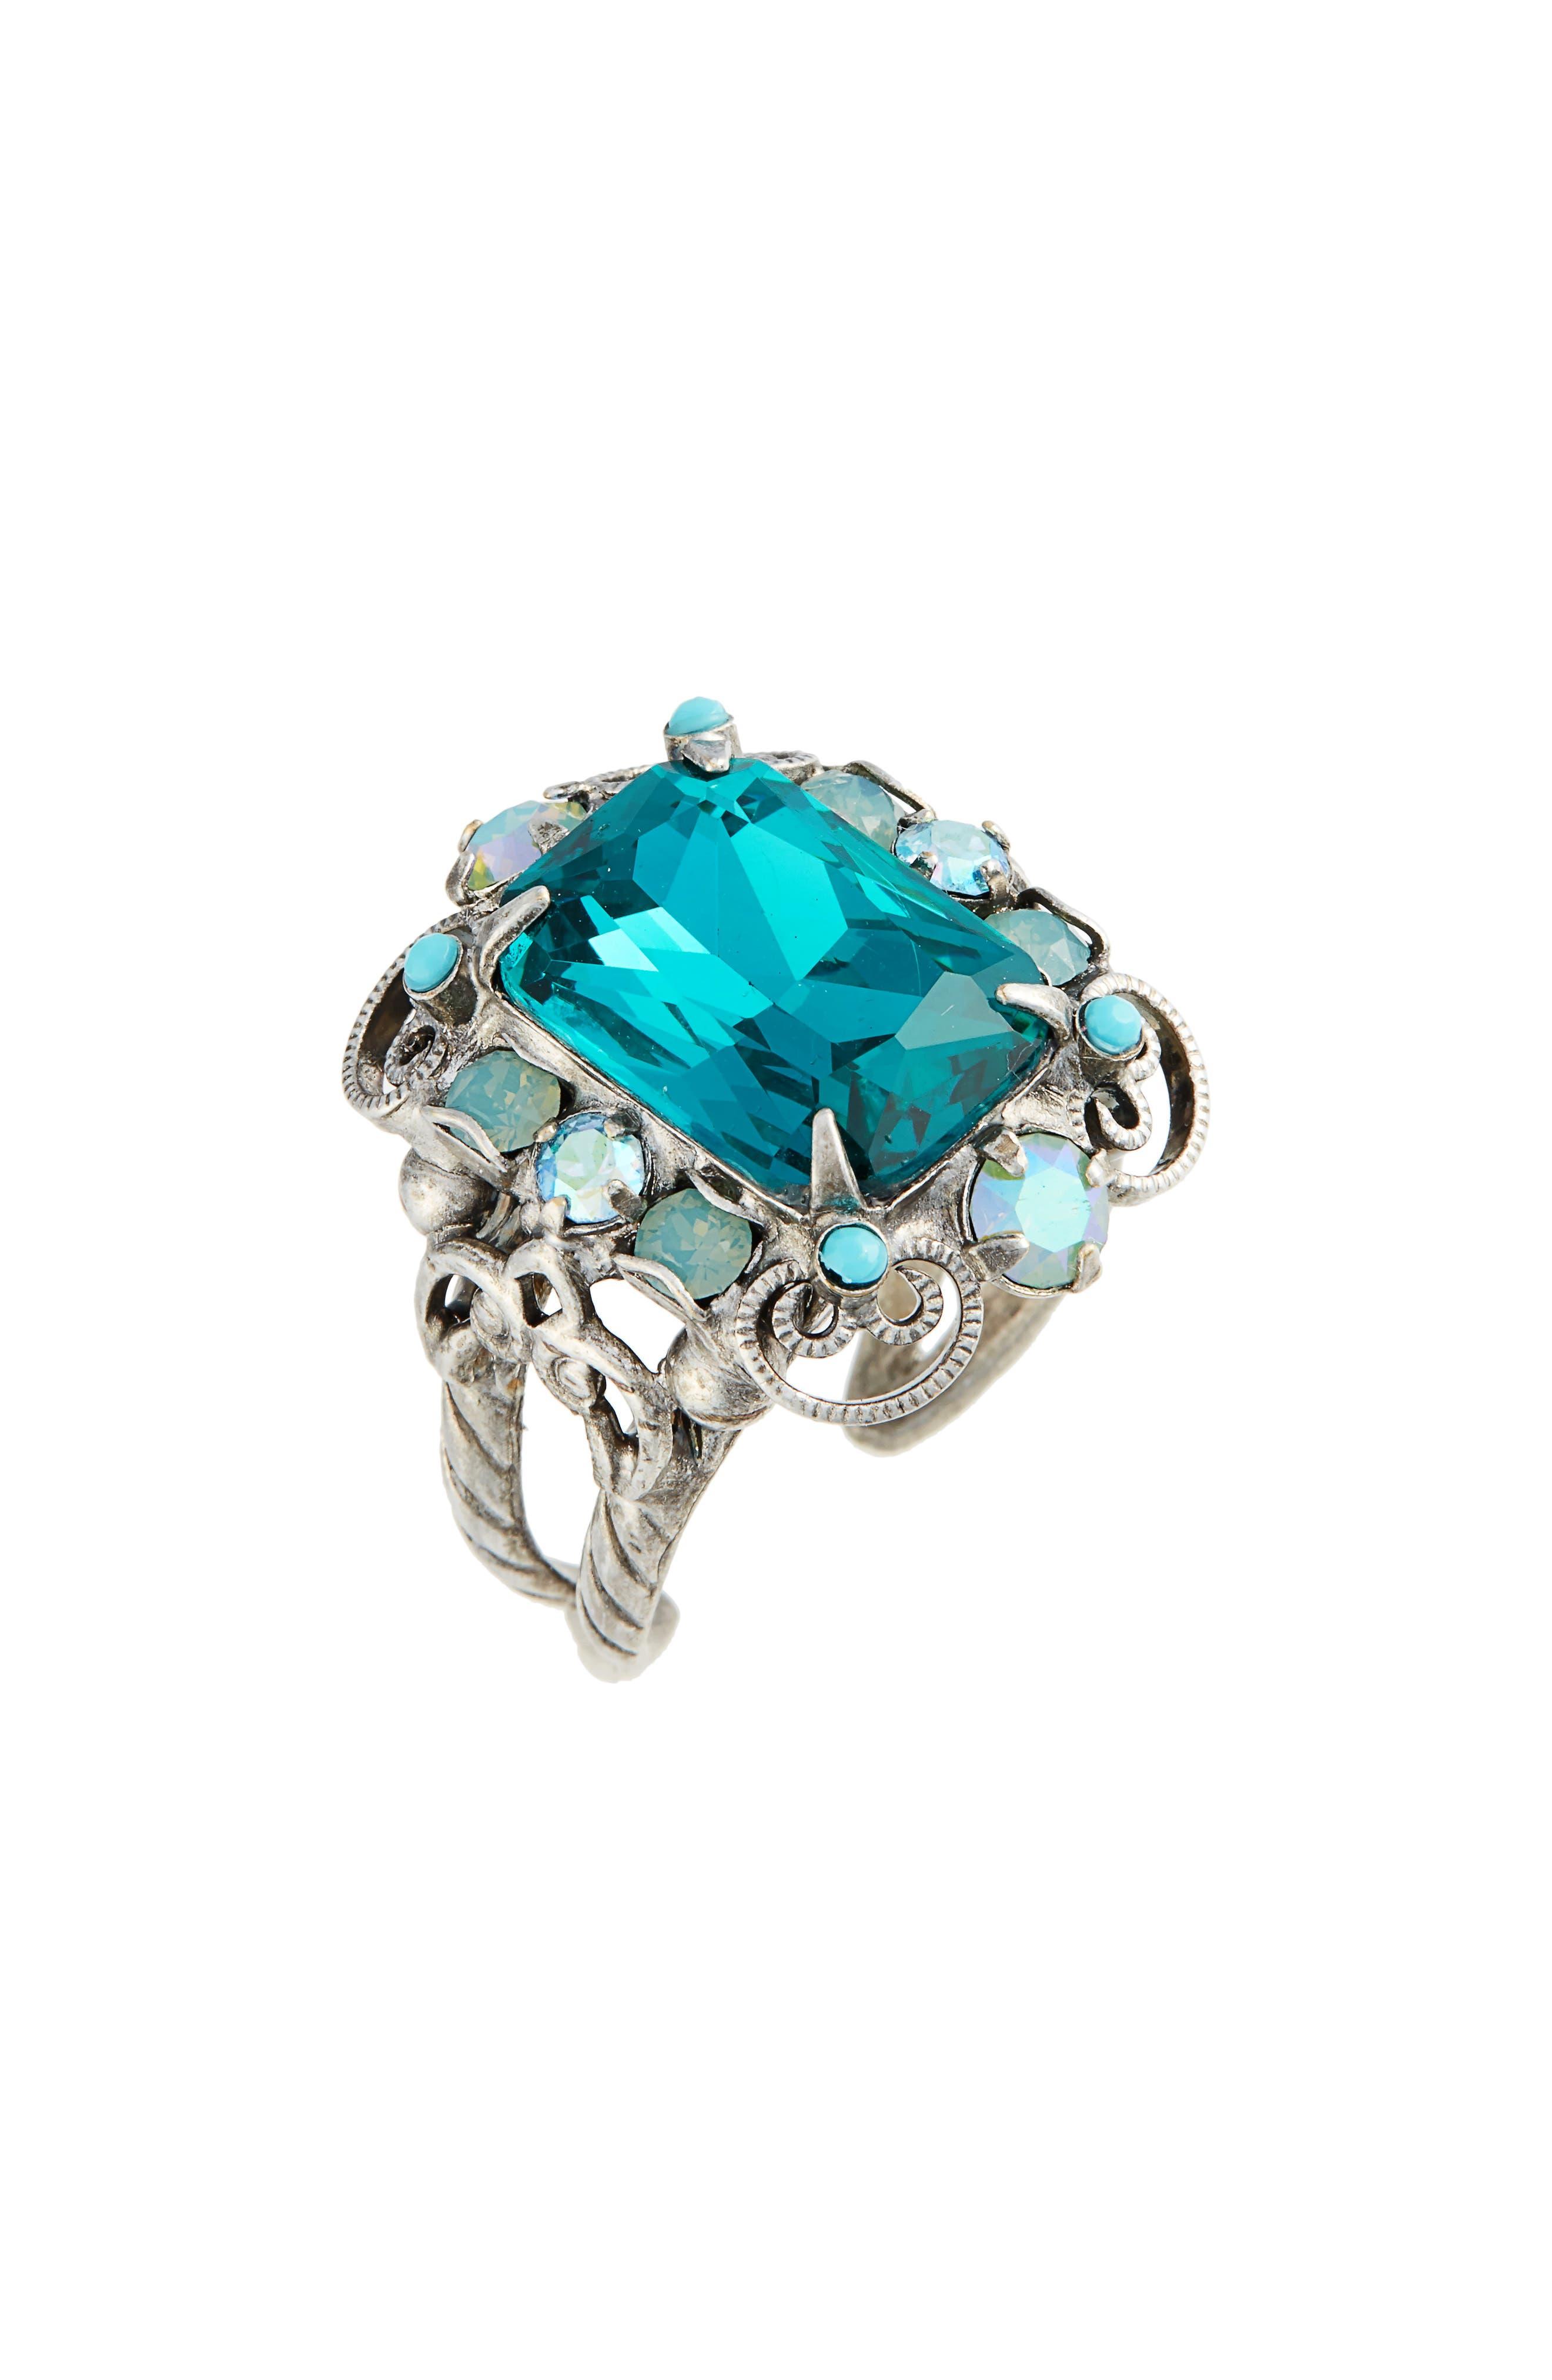 Sugar Maple Crystal Cocktail Ring,                             Main thumbnail 1, color,                             Blue-Green